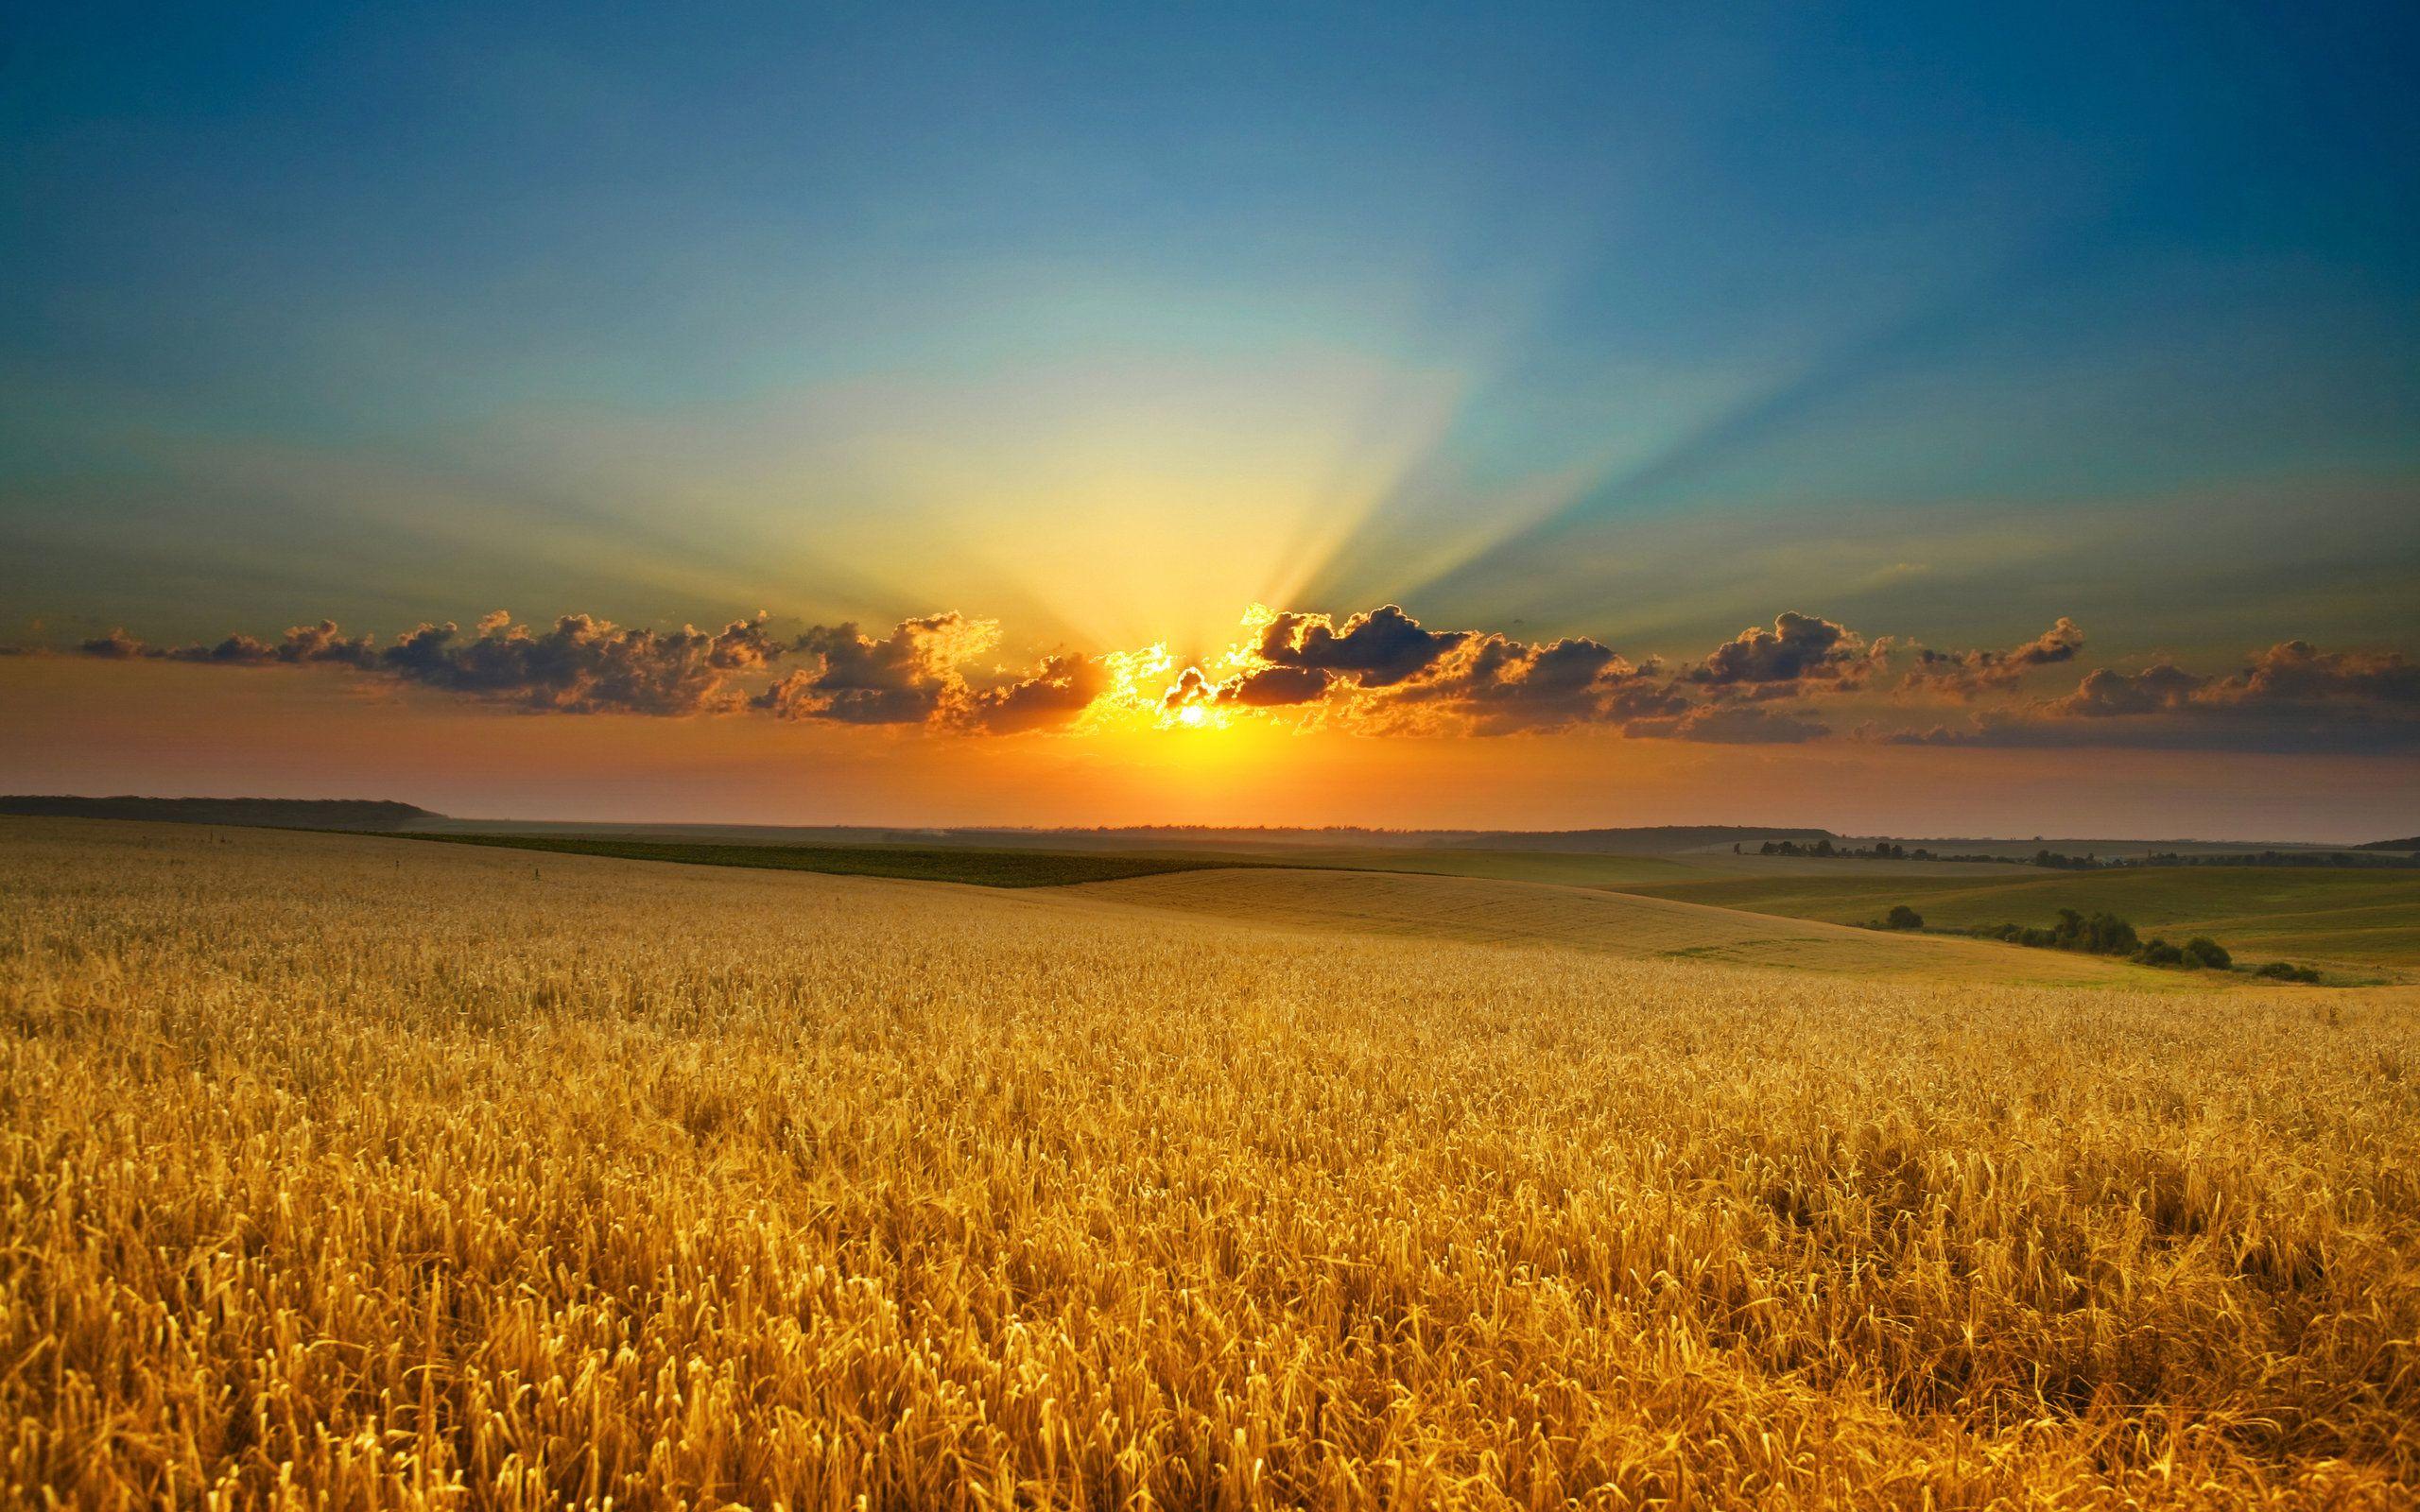 Sun Rise Beautiful Wallpapers hd free Epic Car